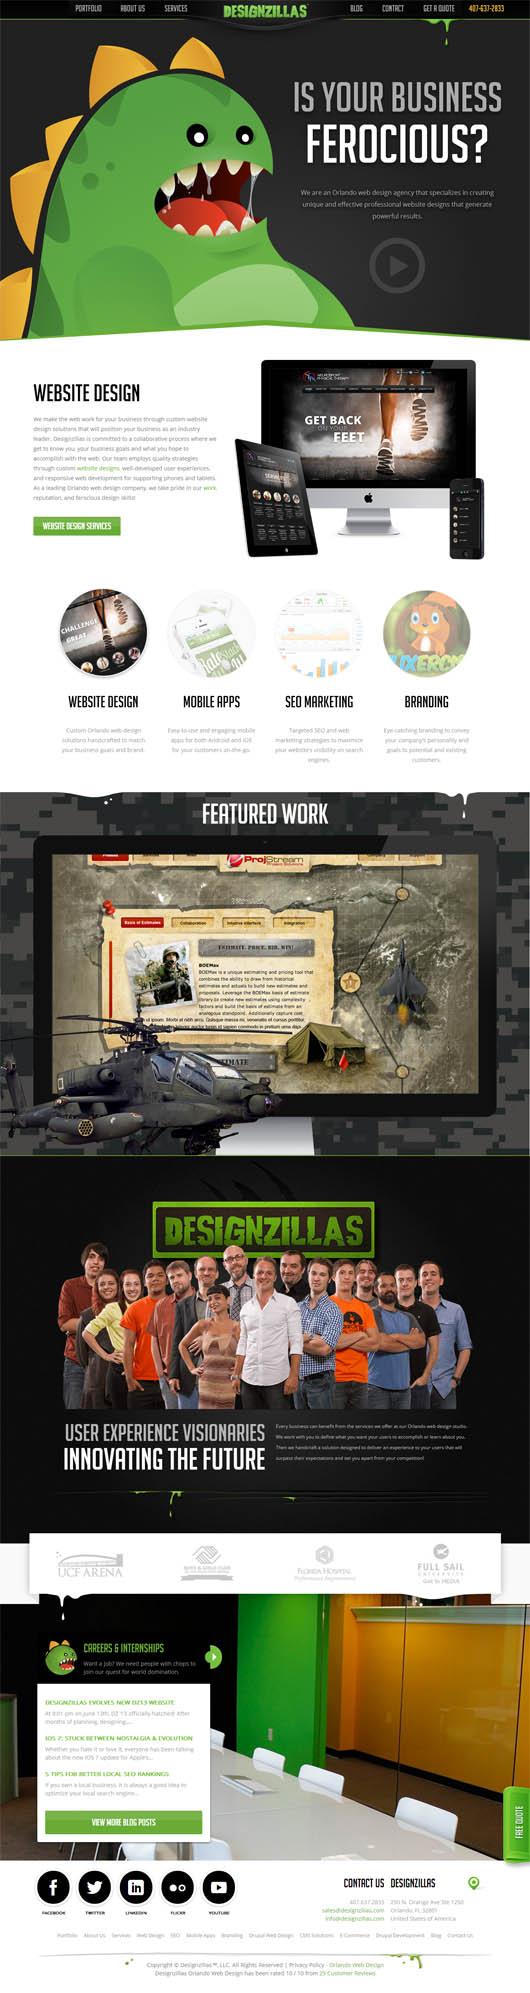 designzilla-big